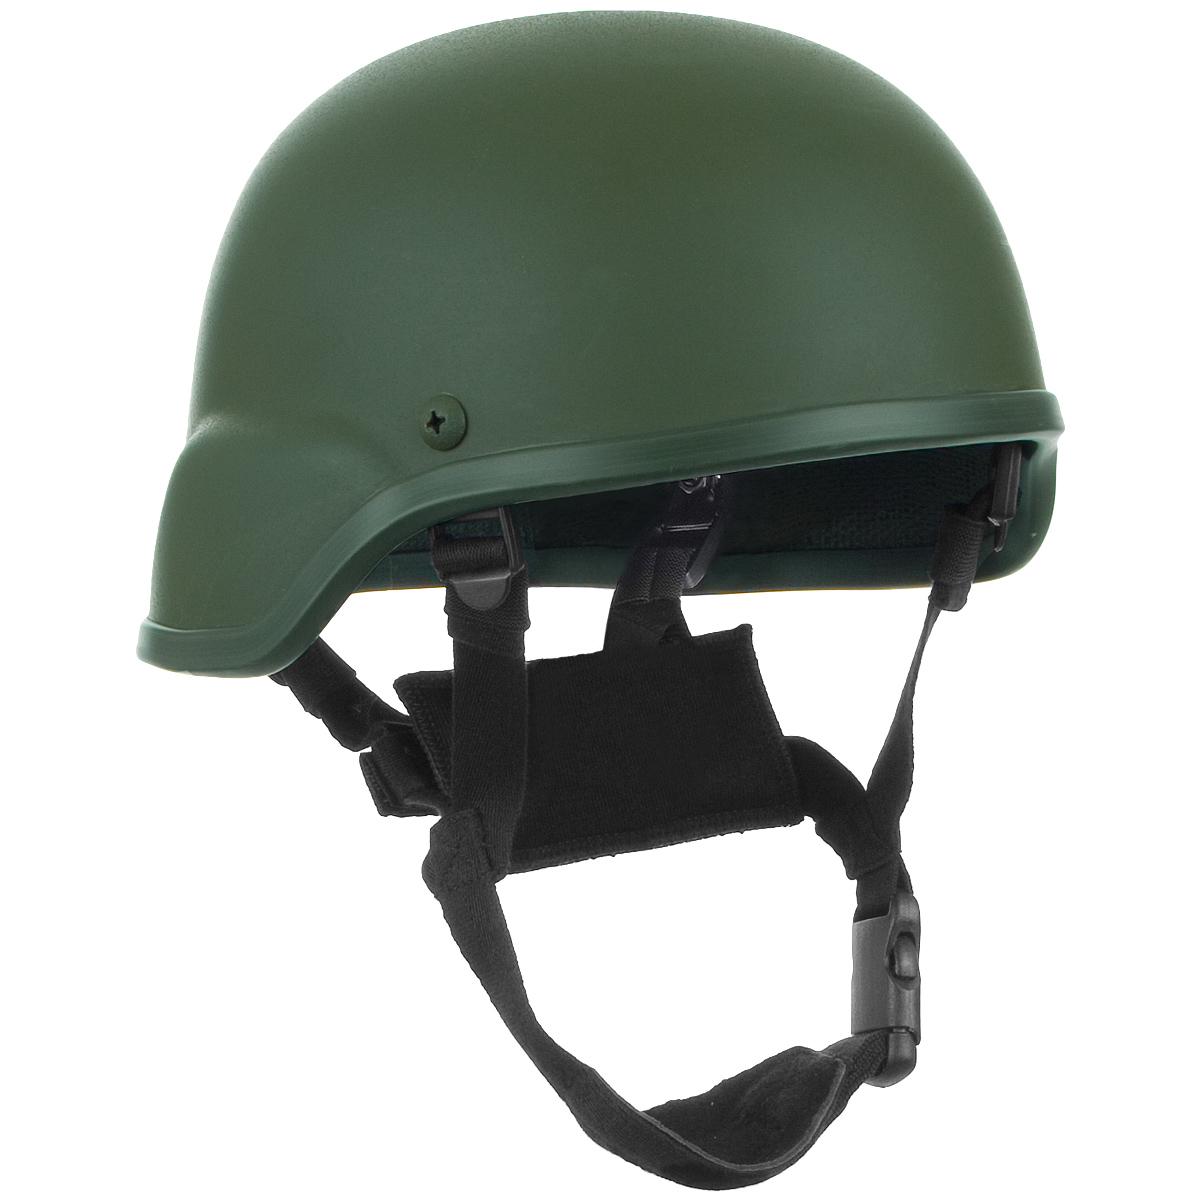 Dating the M1 Steel Helmet